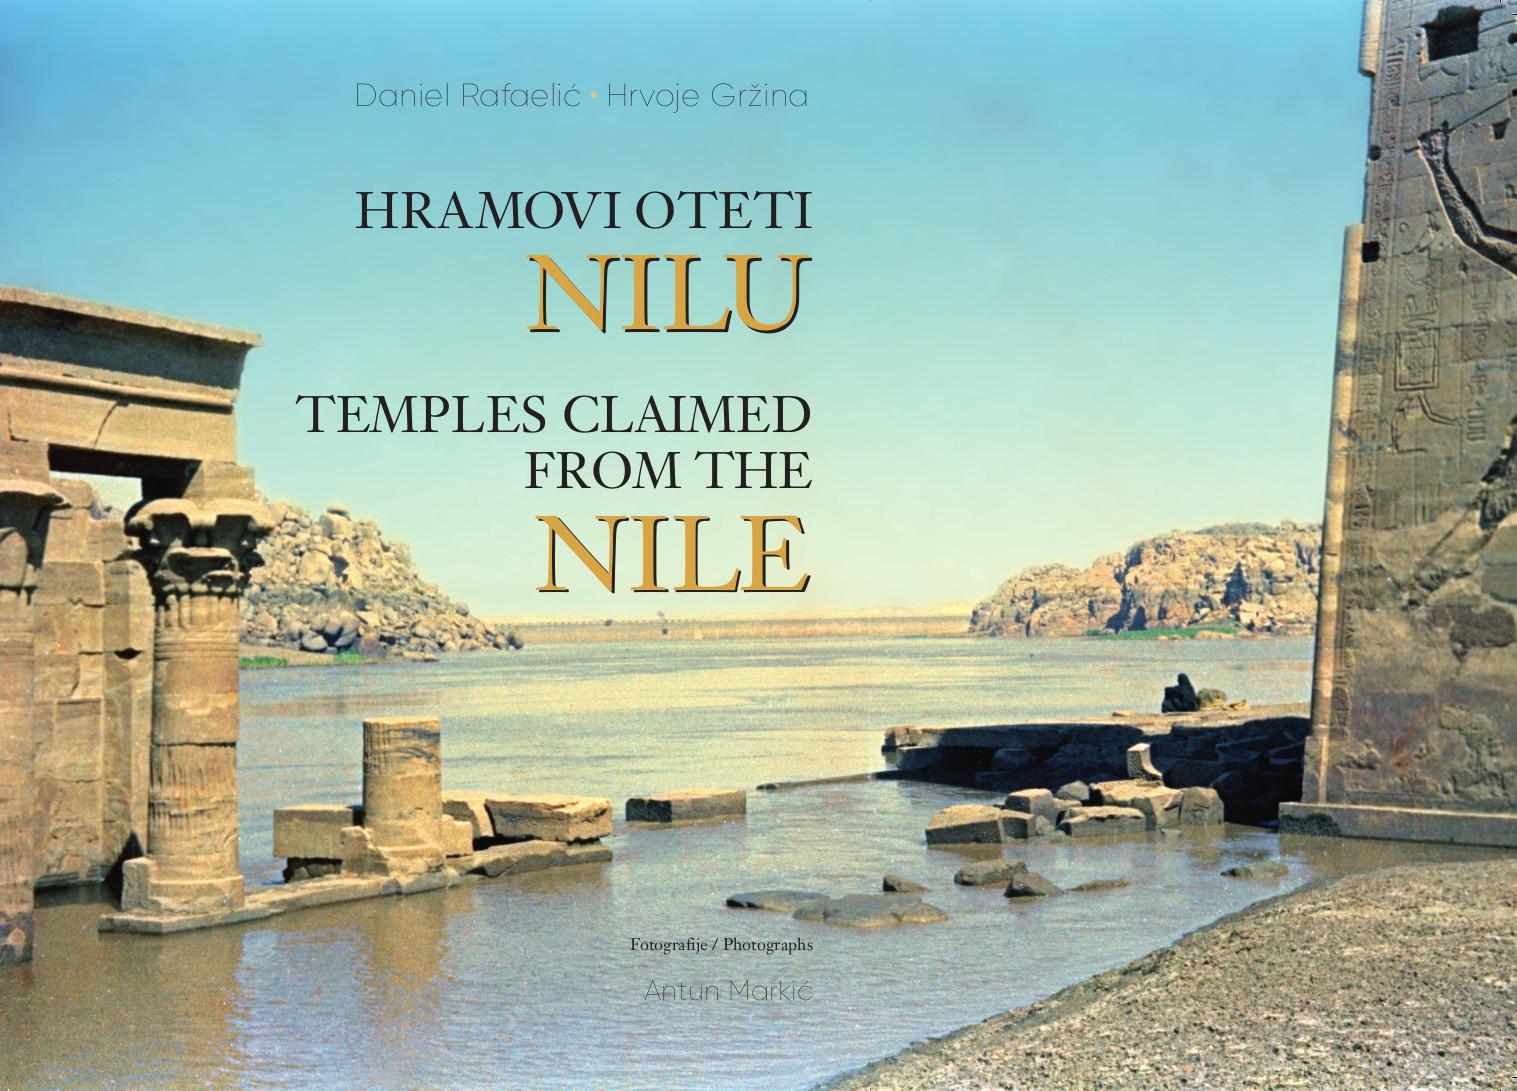 AMZ – Ljeto u Lapidariju AMZ-a: Promocija knjige 'Hramovi oteti Nilu' (PRESS)